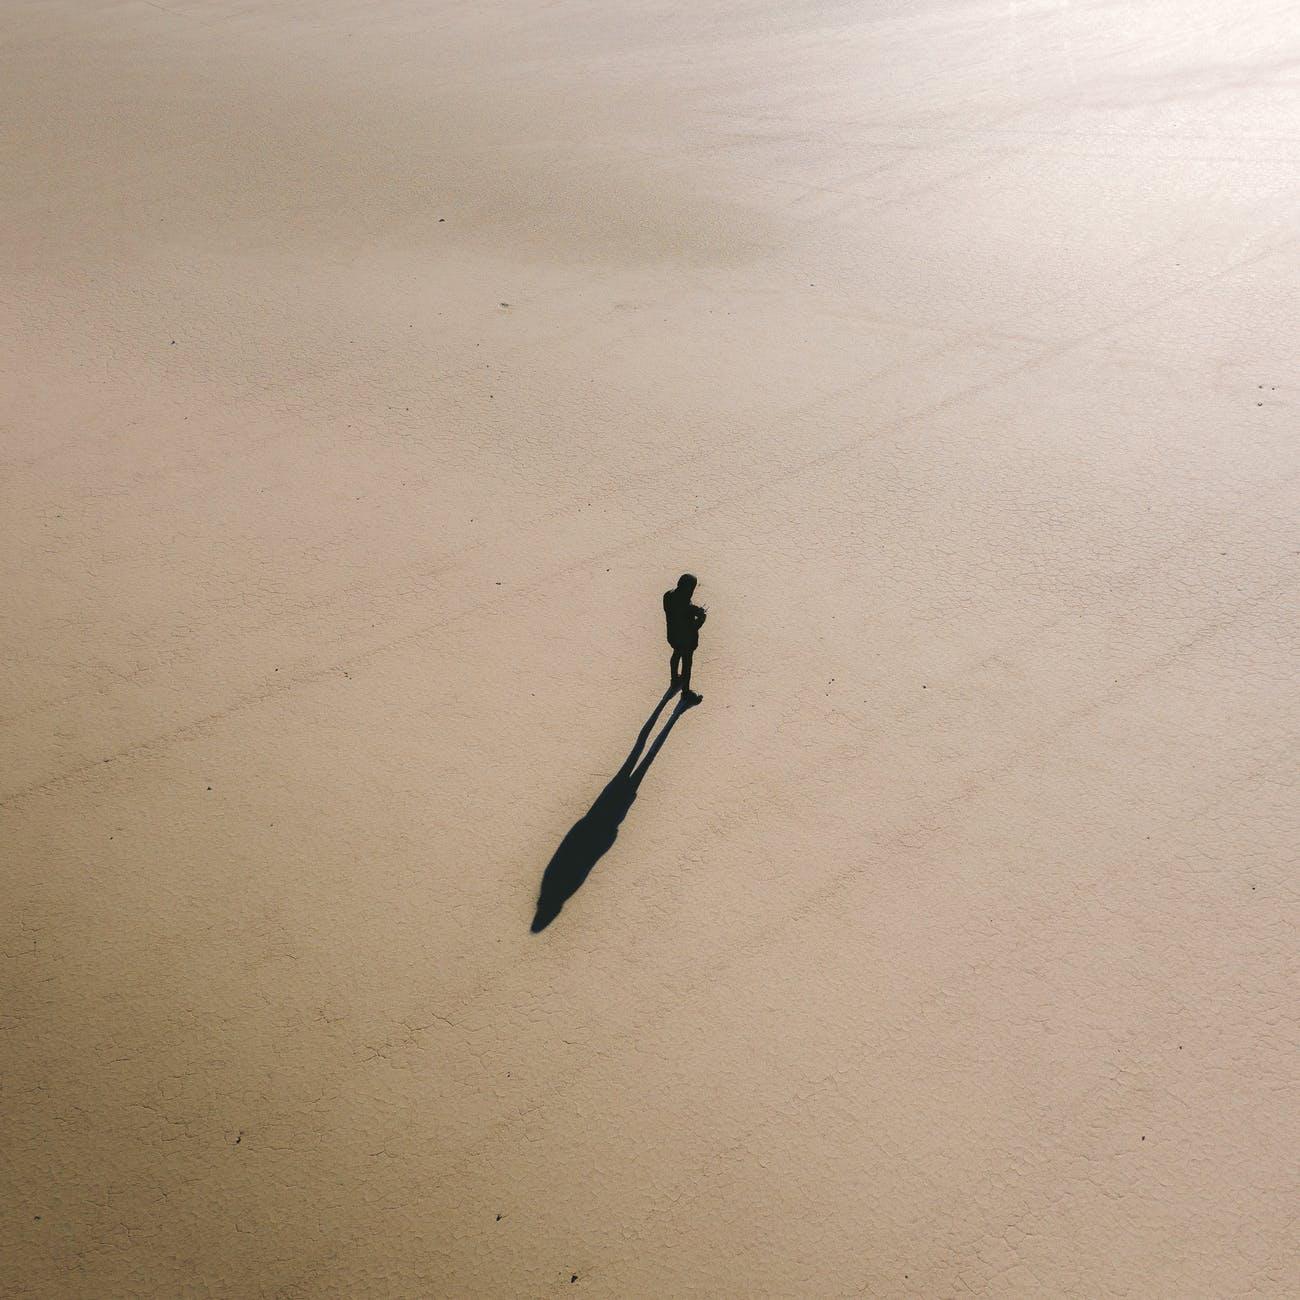 silhouette of man standing on sandy terrain